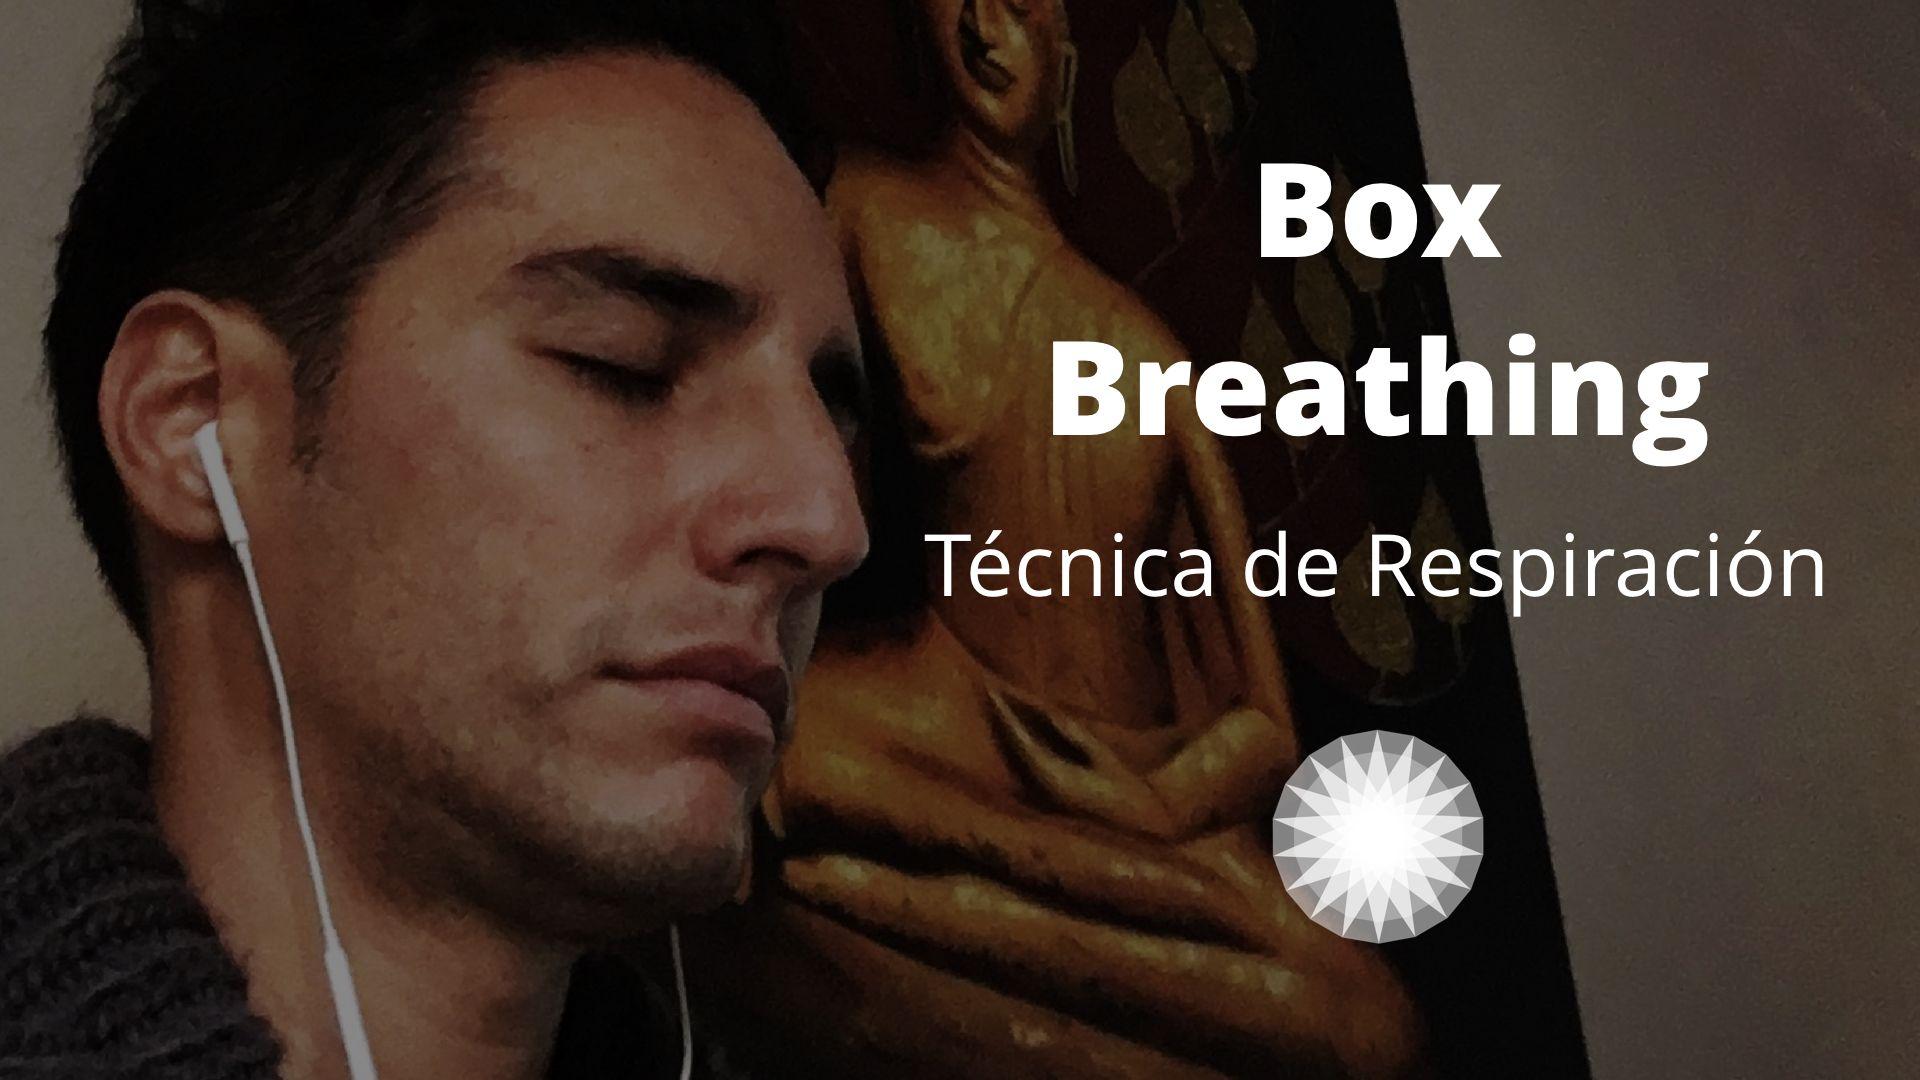 Box Breathing O Técnica De Respiración Del Cuadrilátero